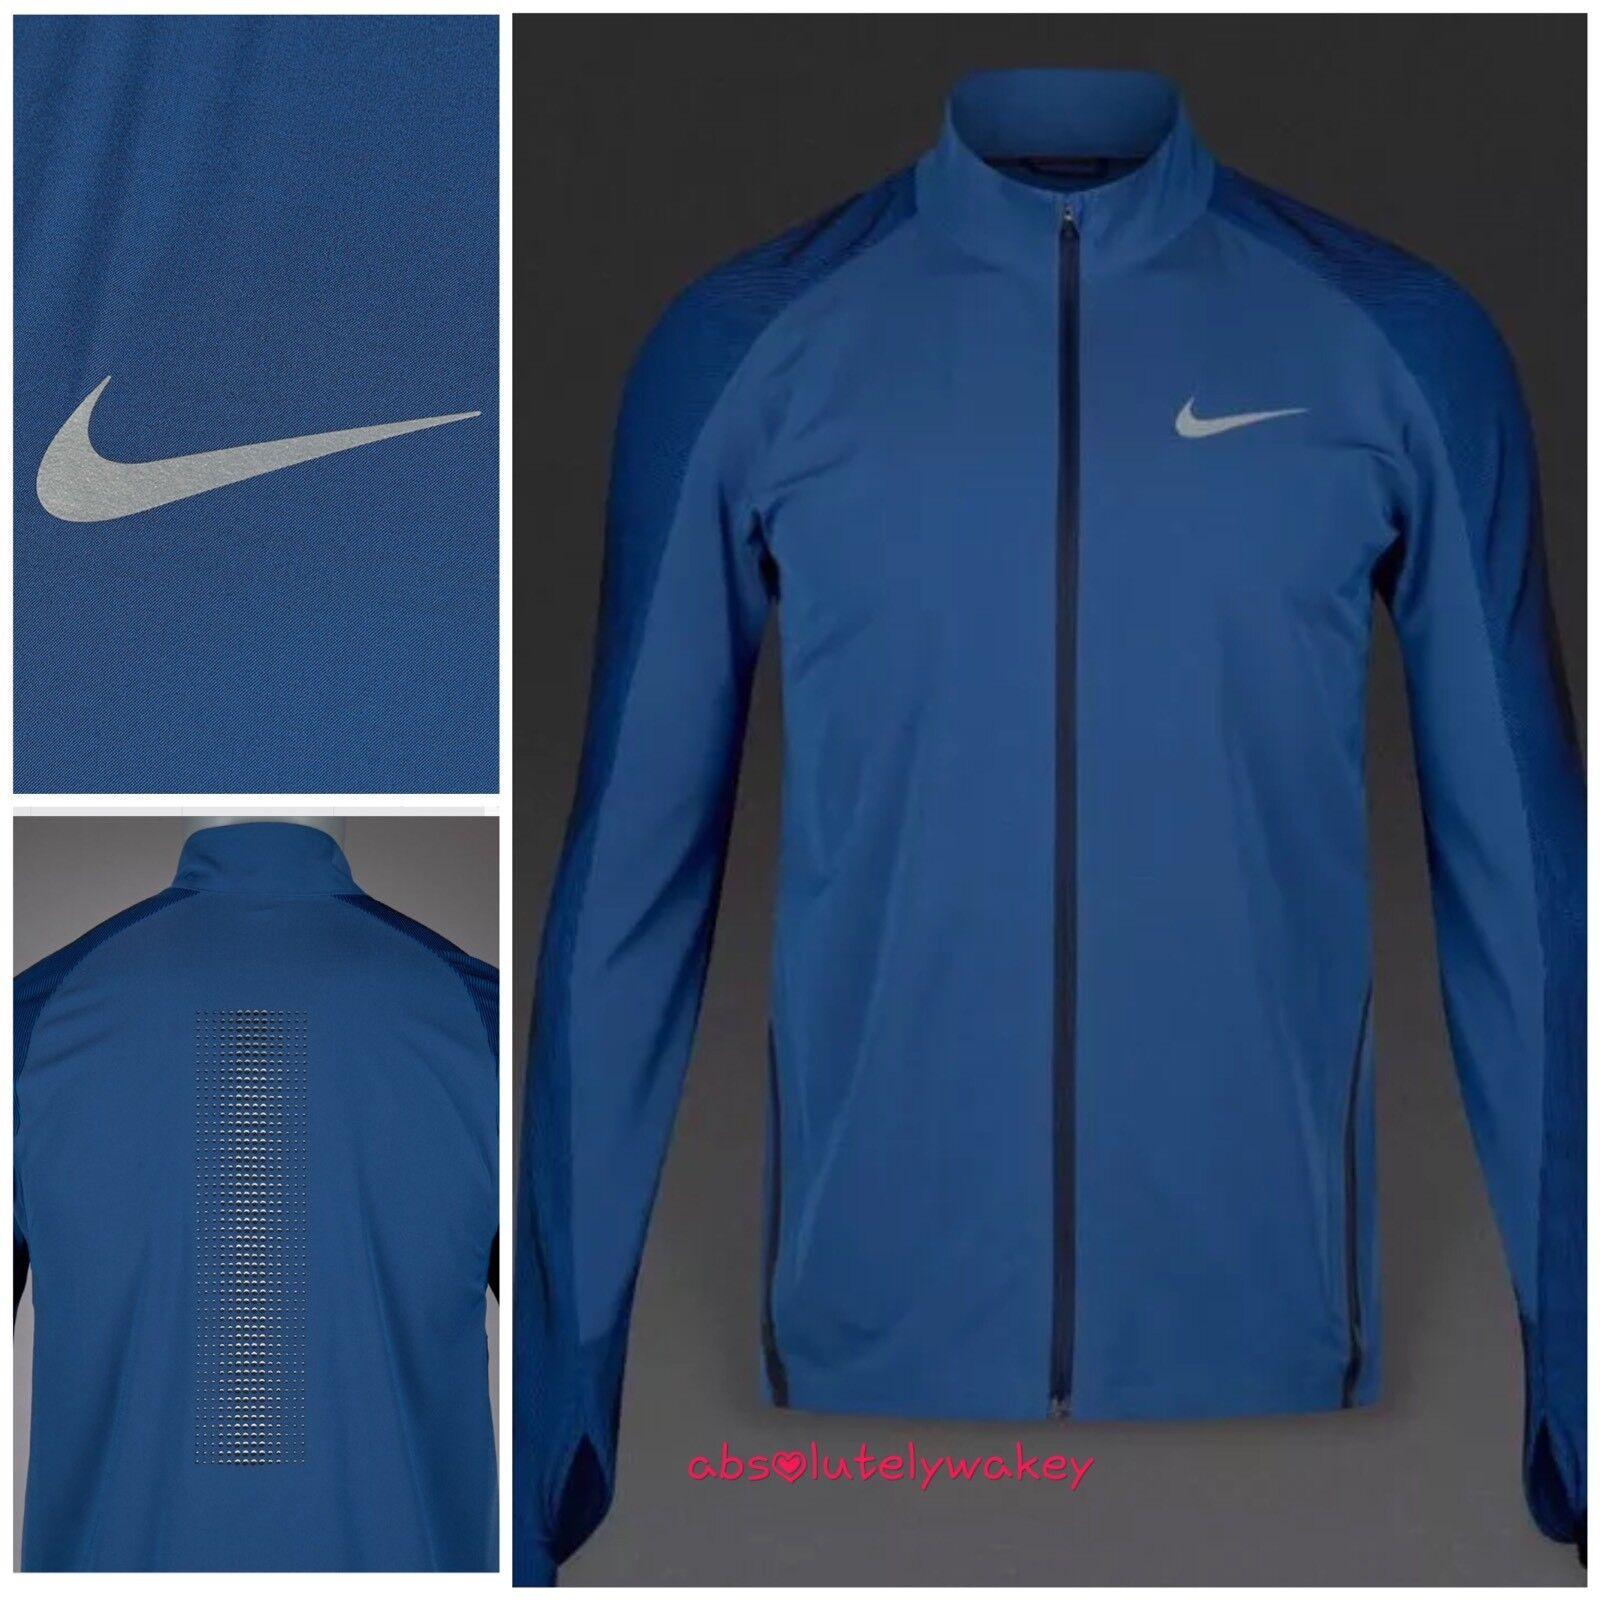 Nike Herren Twill Laufen Stadion Jacke Wasserabweisend Obsidian   Reflec Silber